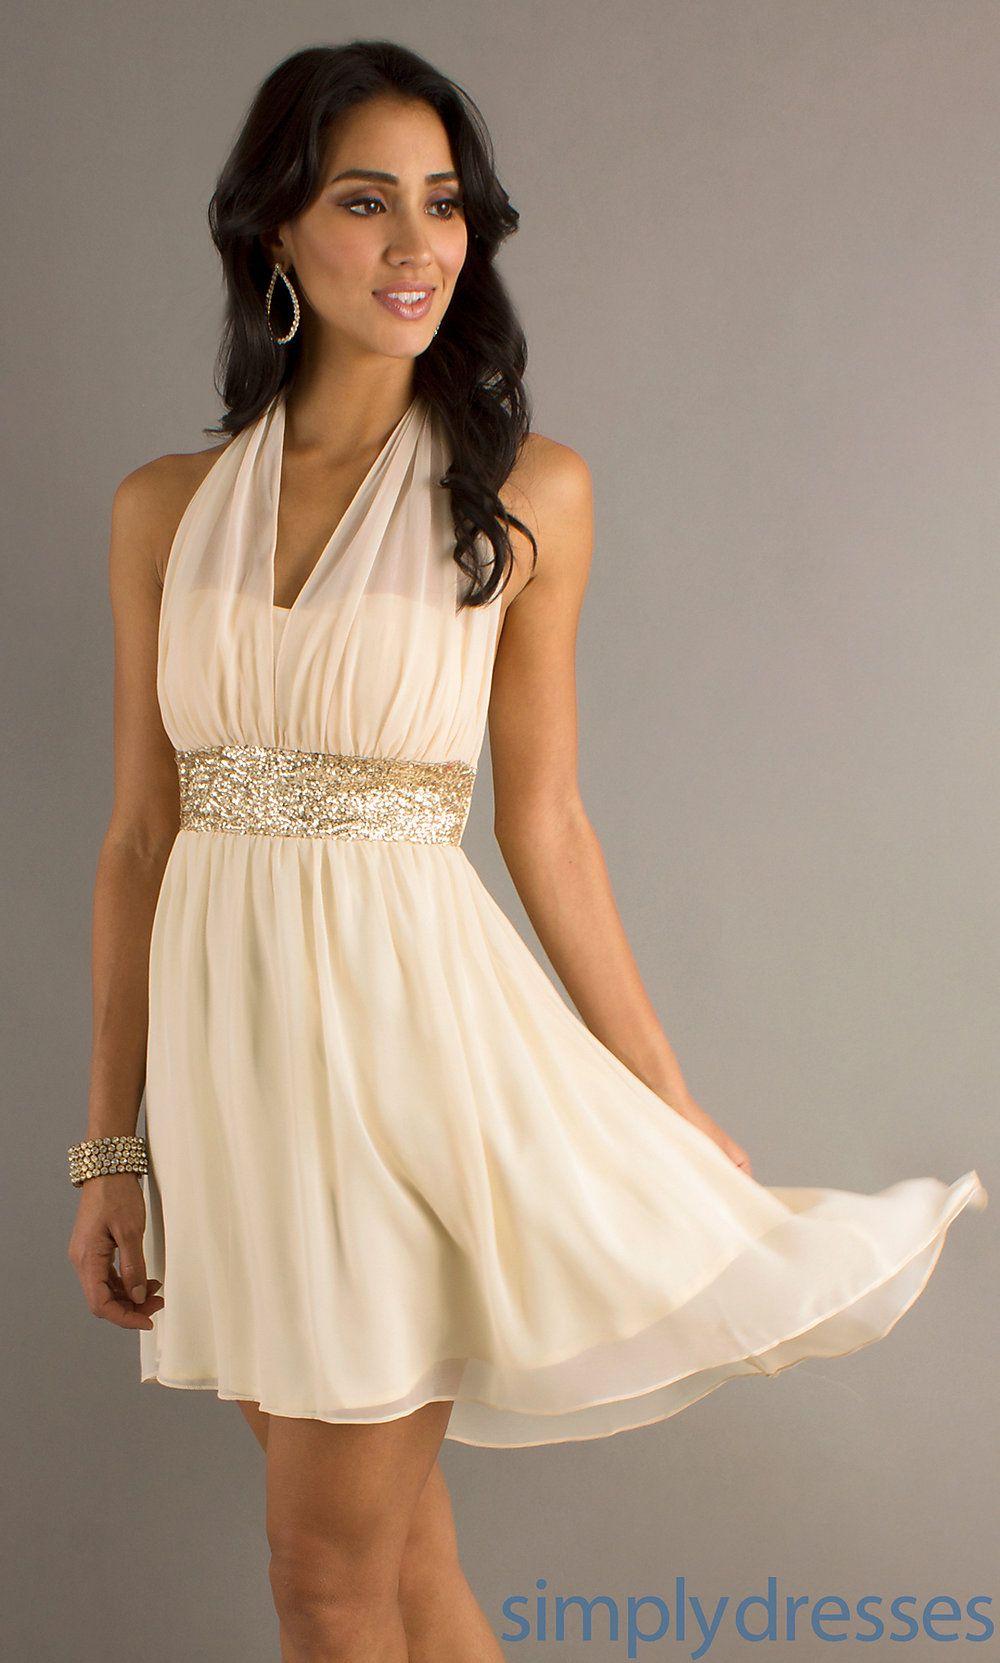 Short Halter Cocktail Dress, Short Prom Dresses - Simply Dresses ...